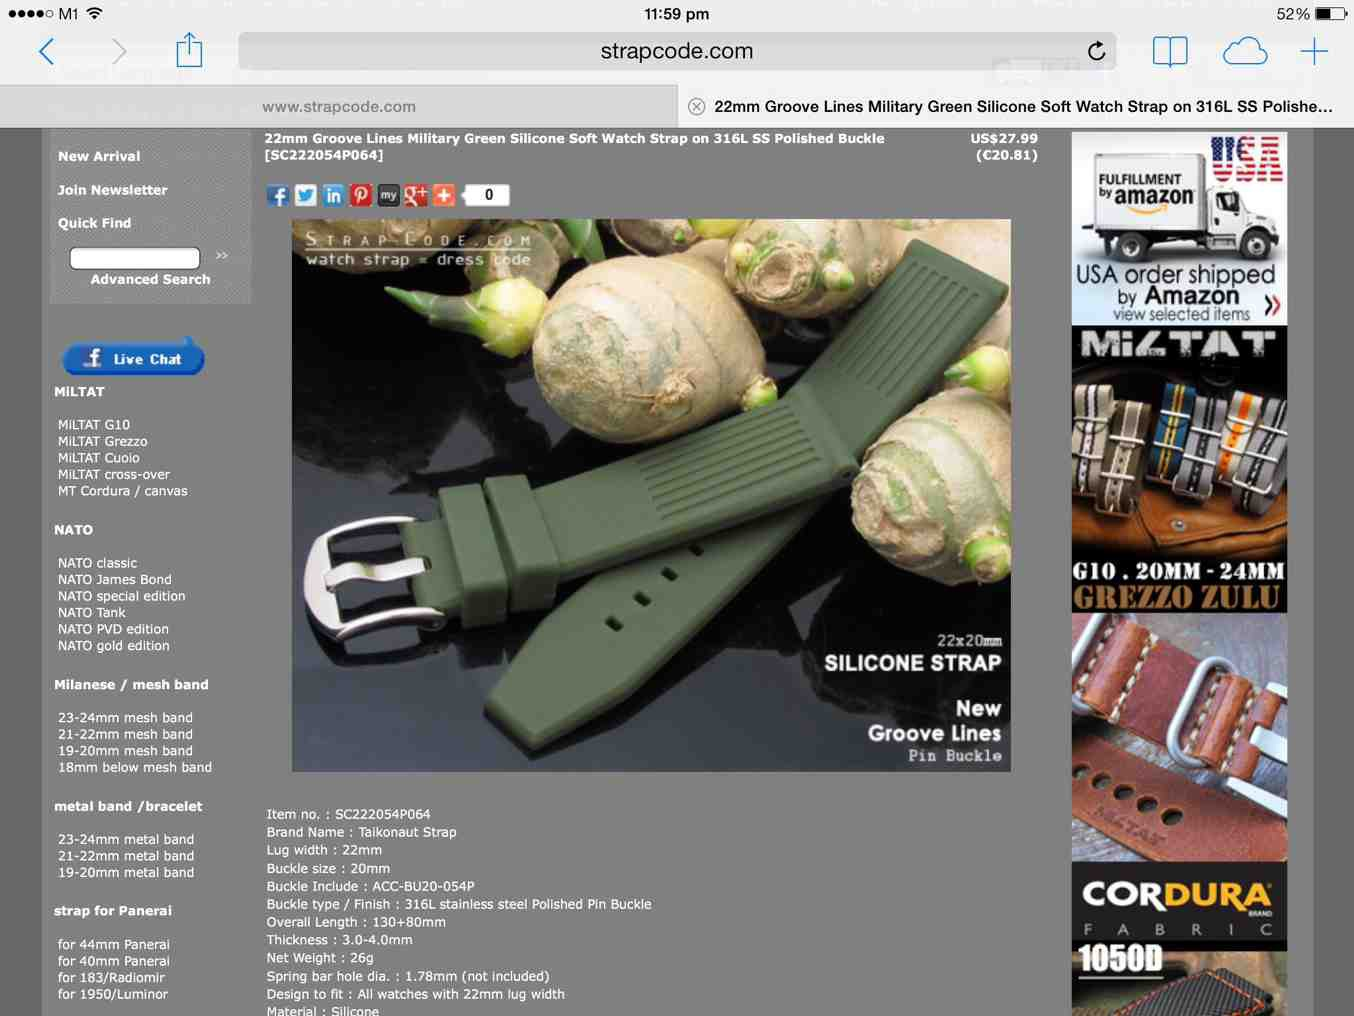 Where to find Green Rubber Strap for the SKX007 - Seiko